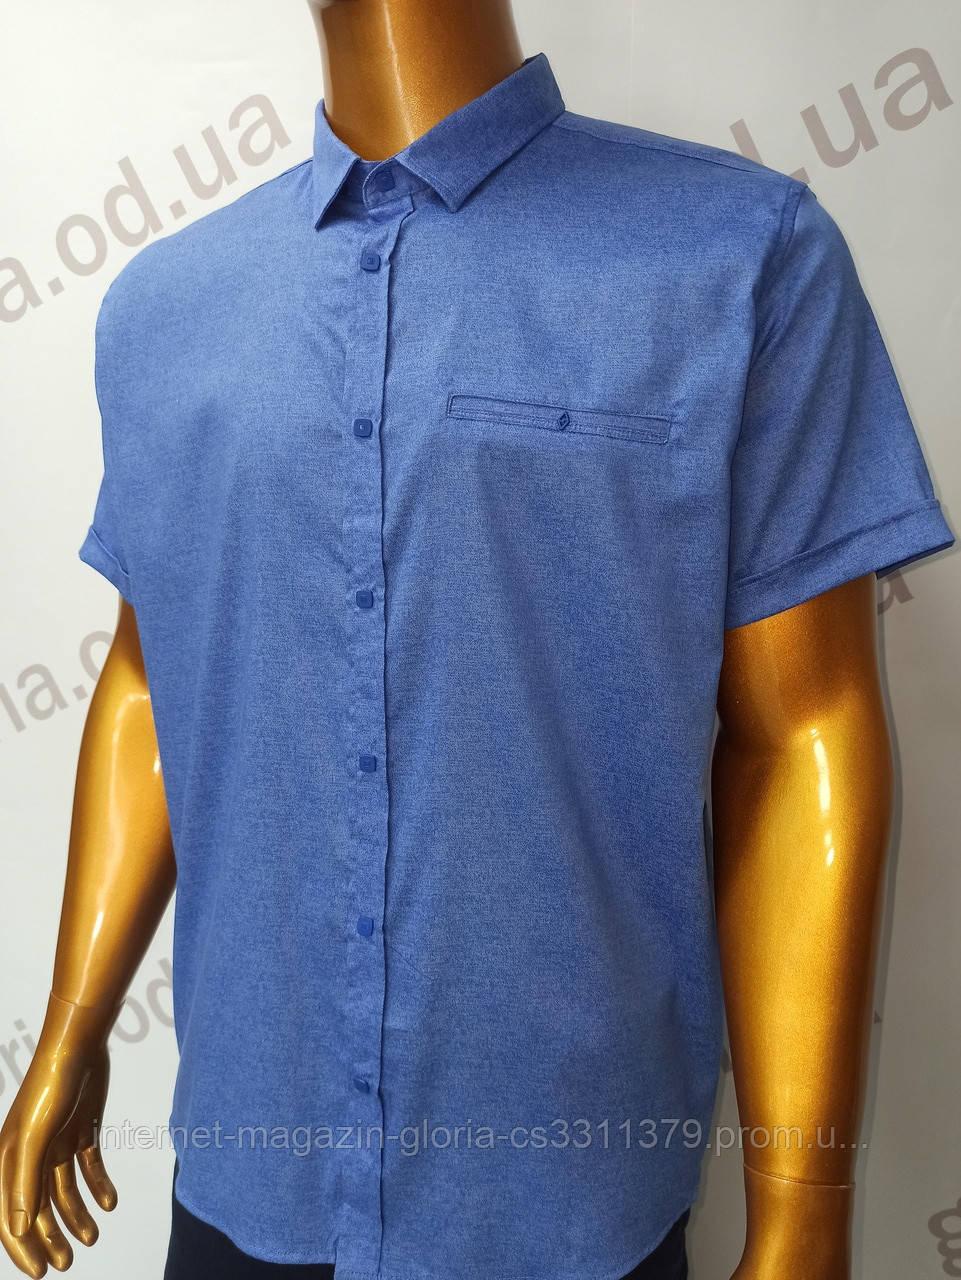 Мужская рубашка Amato. AG. 29397-2(g).Батал. Размеры: 2XL,3XL,4XL,5XL.